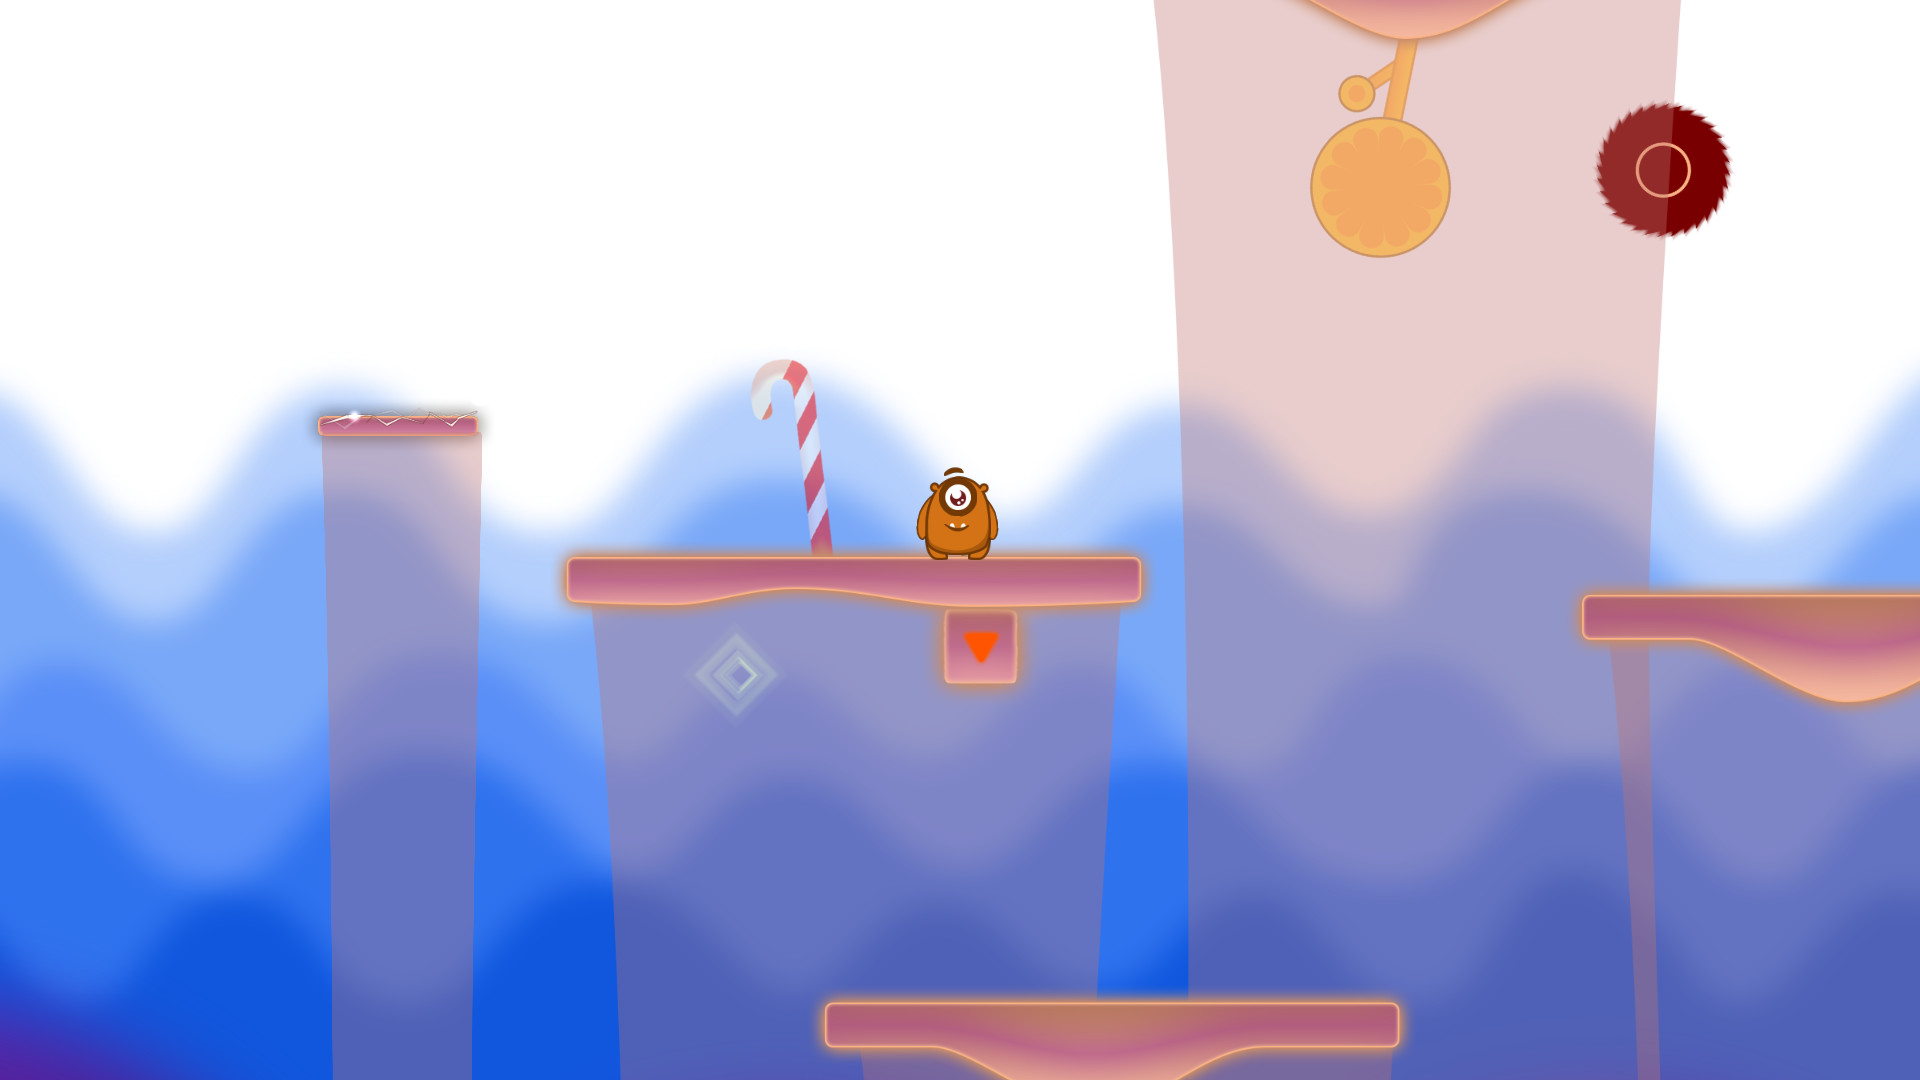 Inversion screenshot